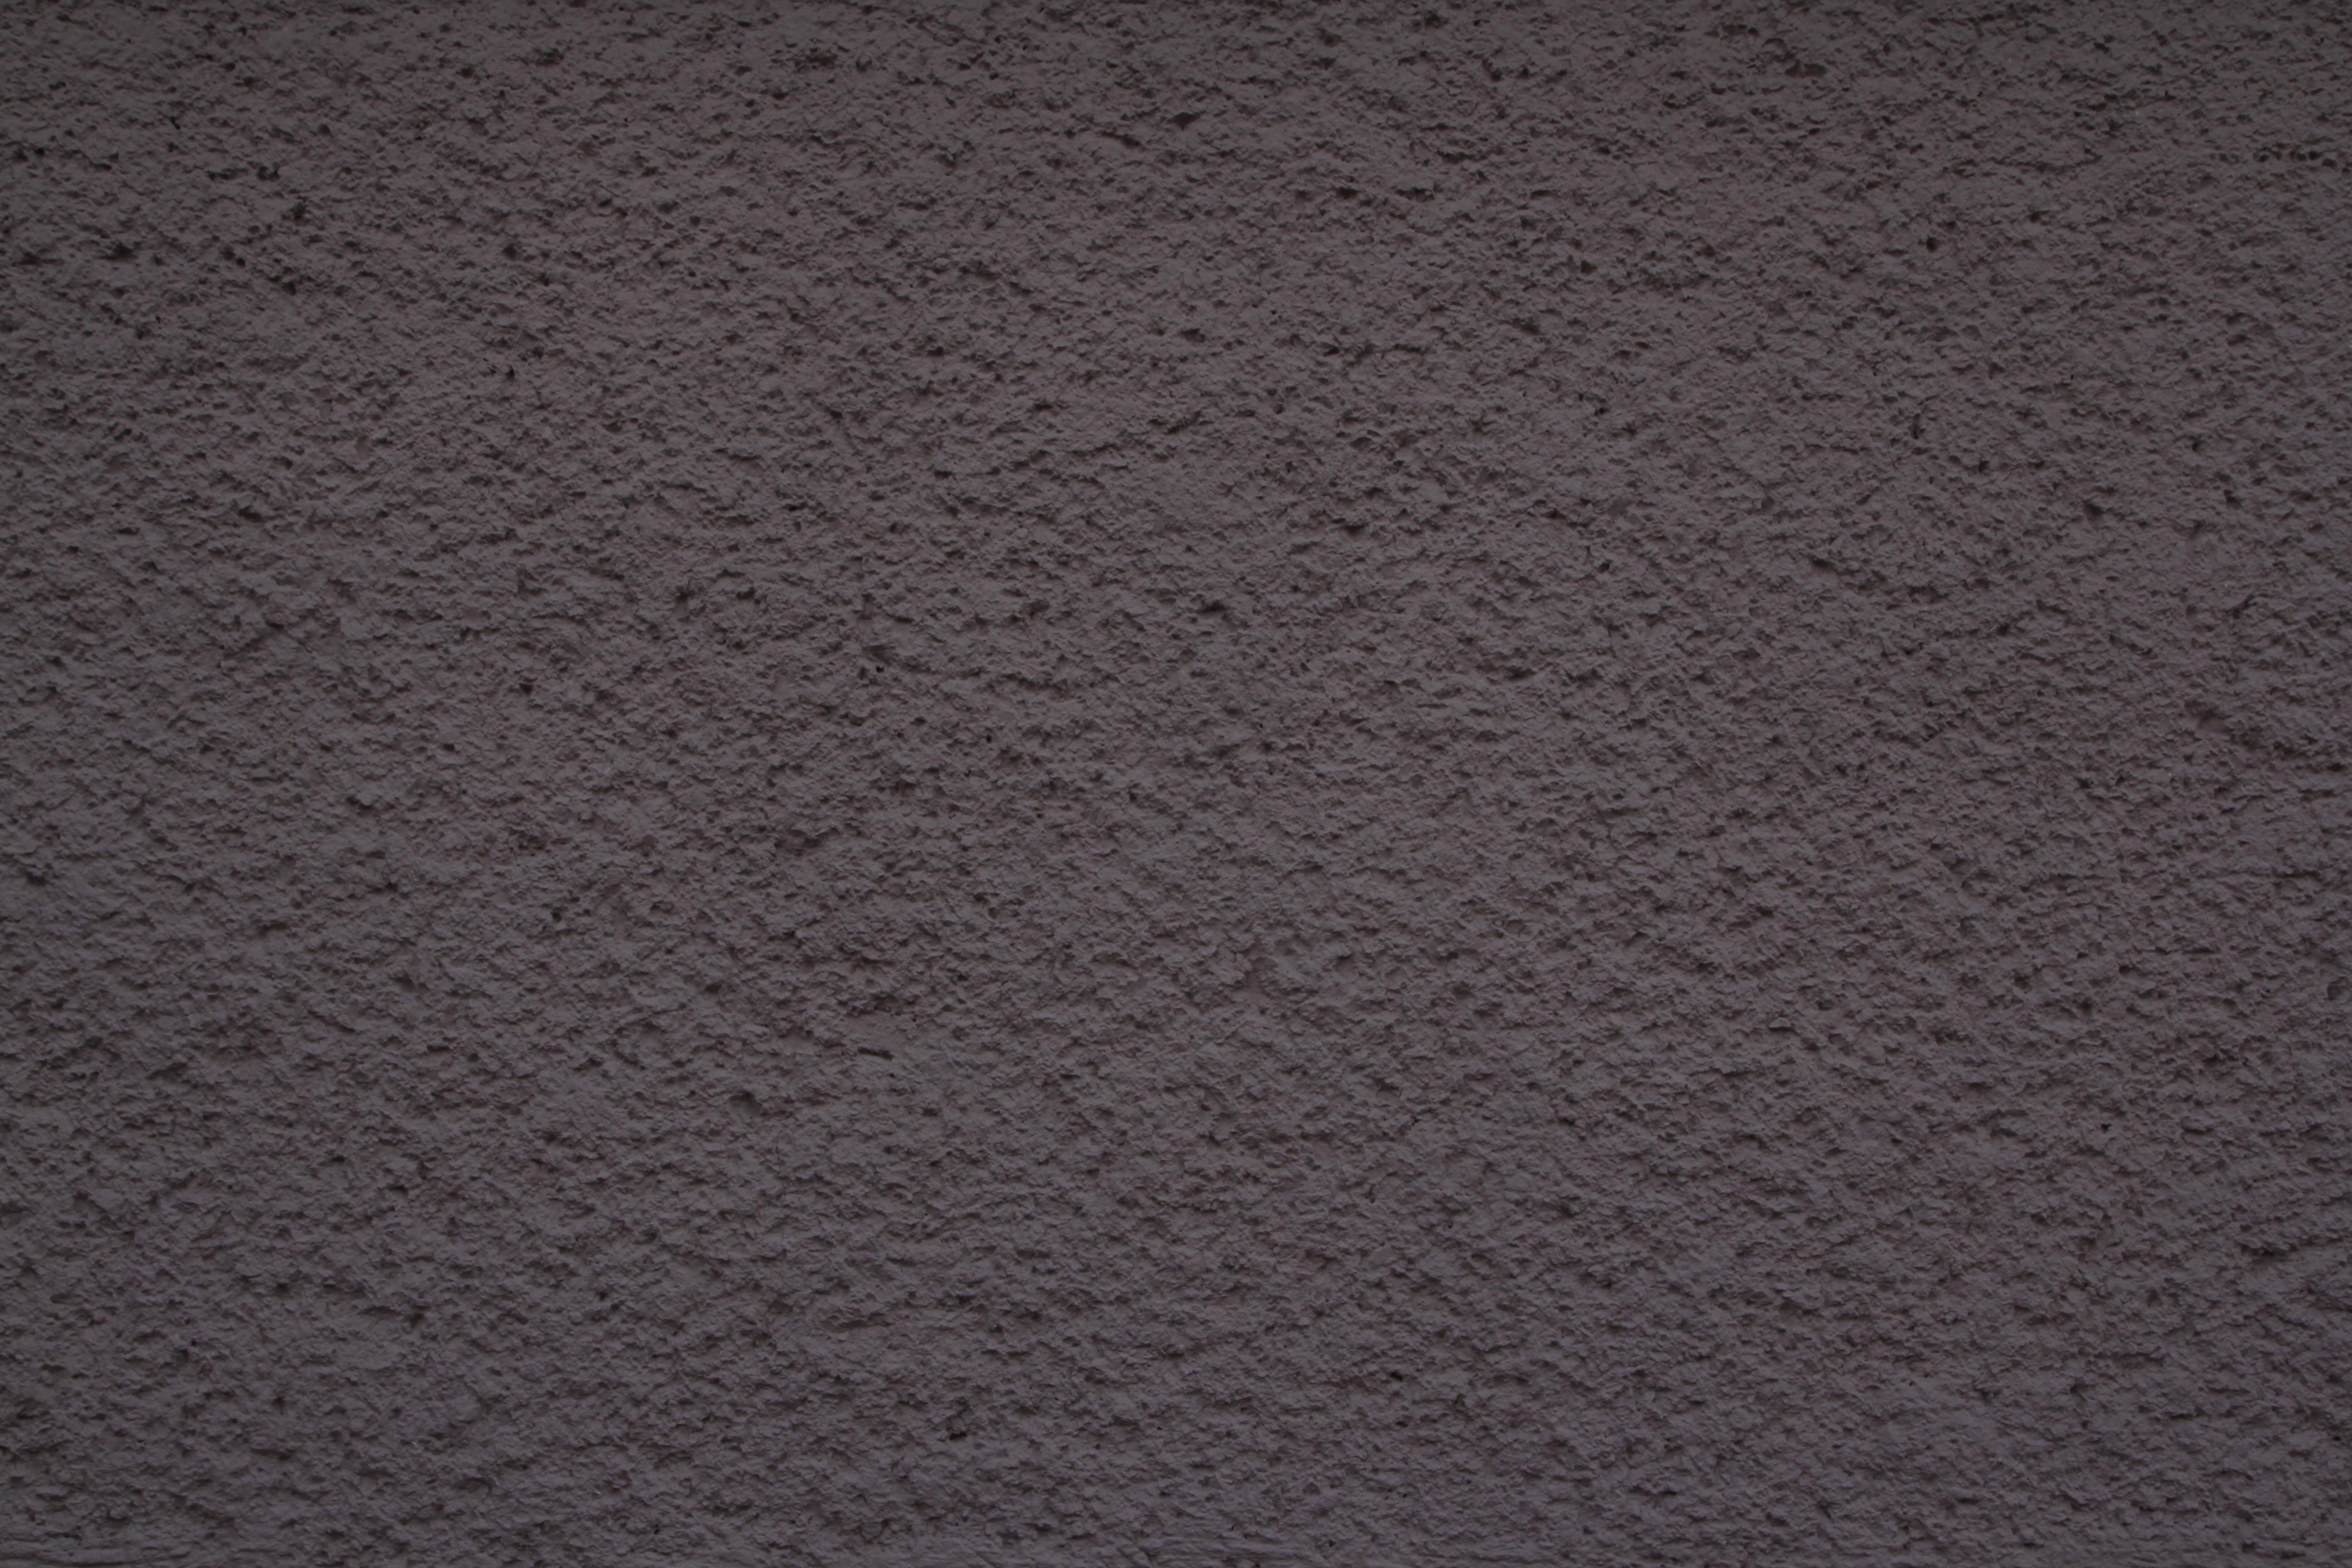 Dark grey painted concrete wall - Concrete - Texturify - Free textures